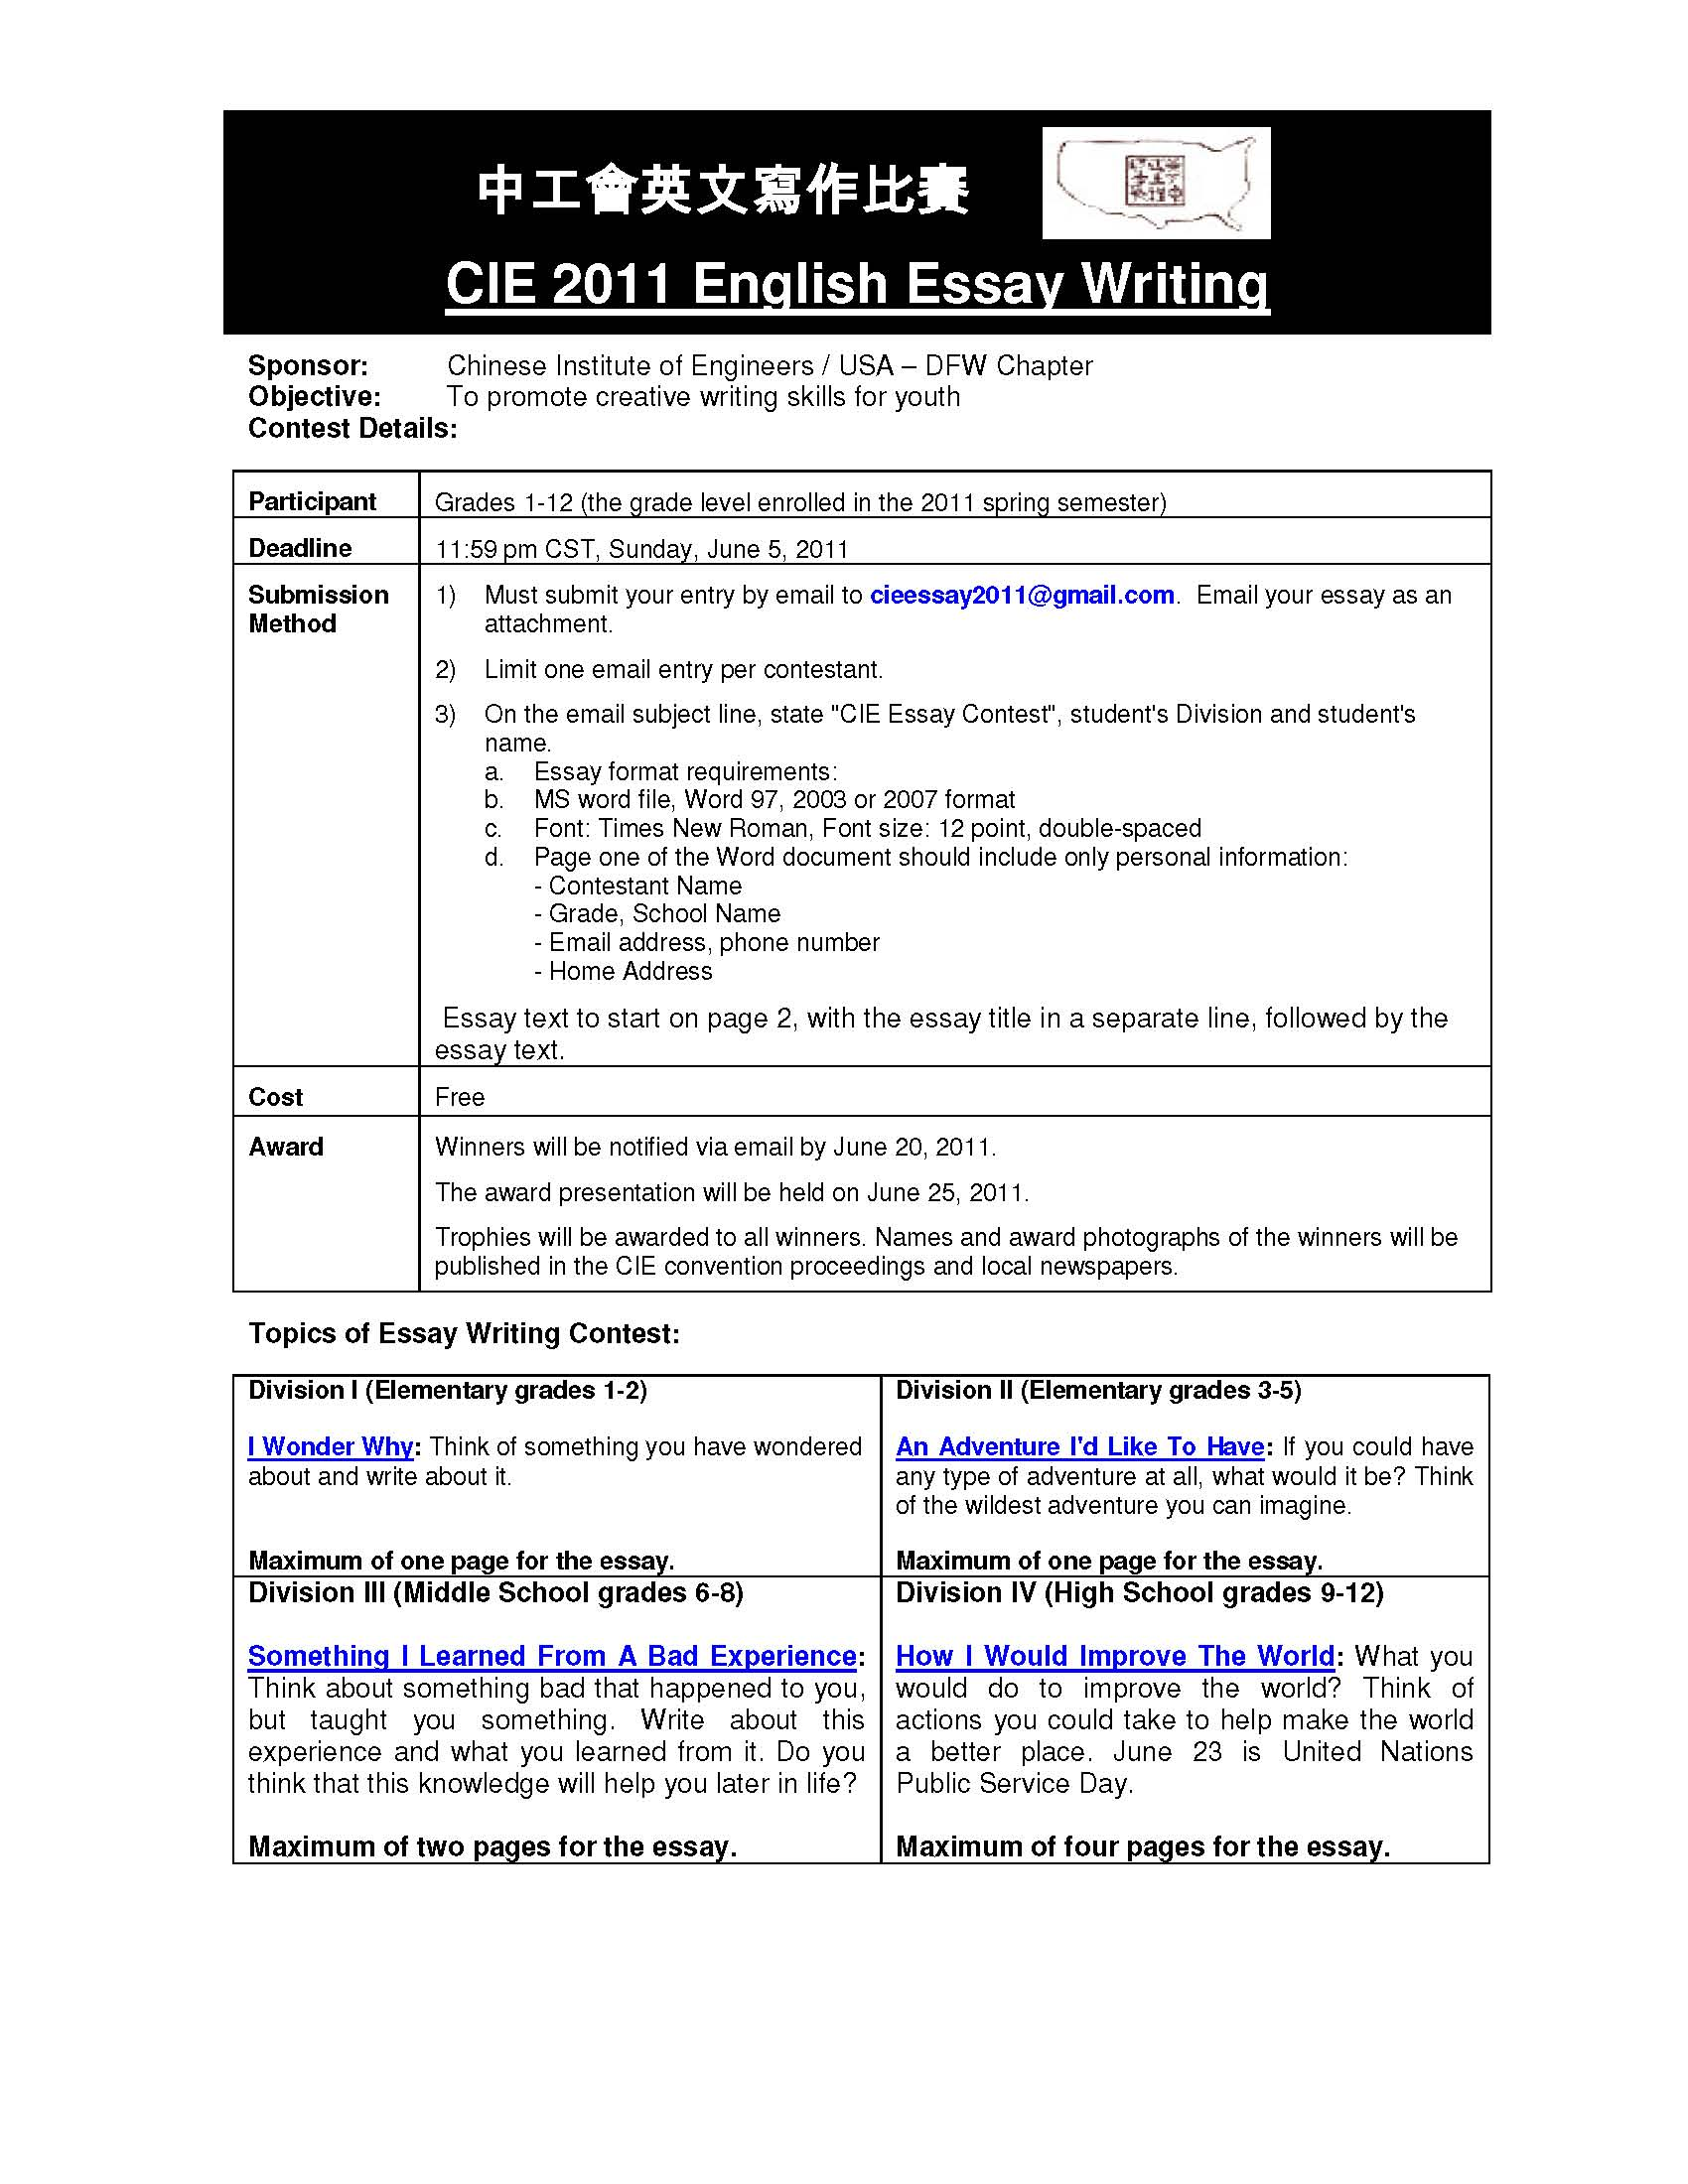 007 Essay Example Flyer Free Writing Shocking Service Draft Online Uk Full